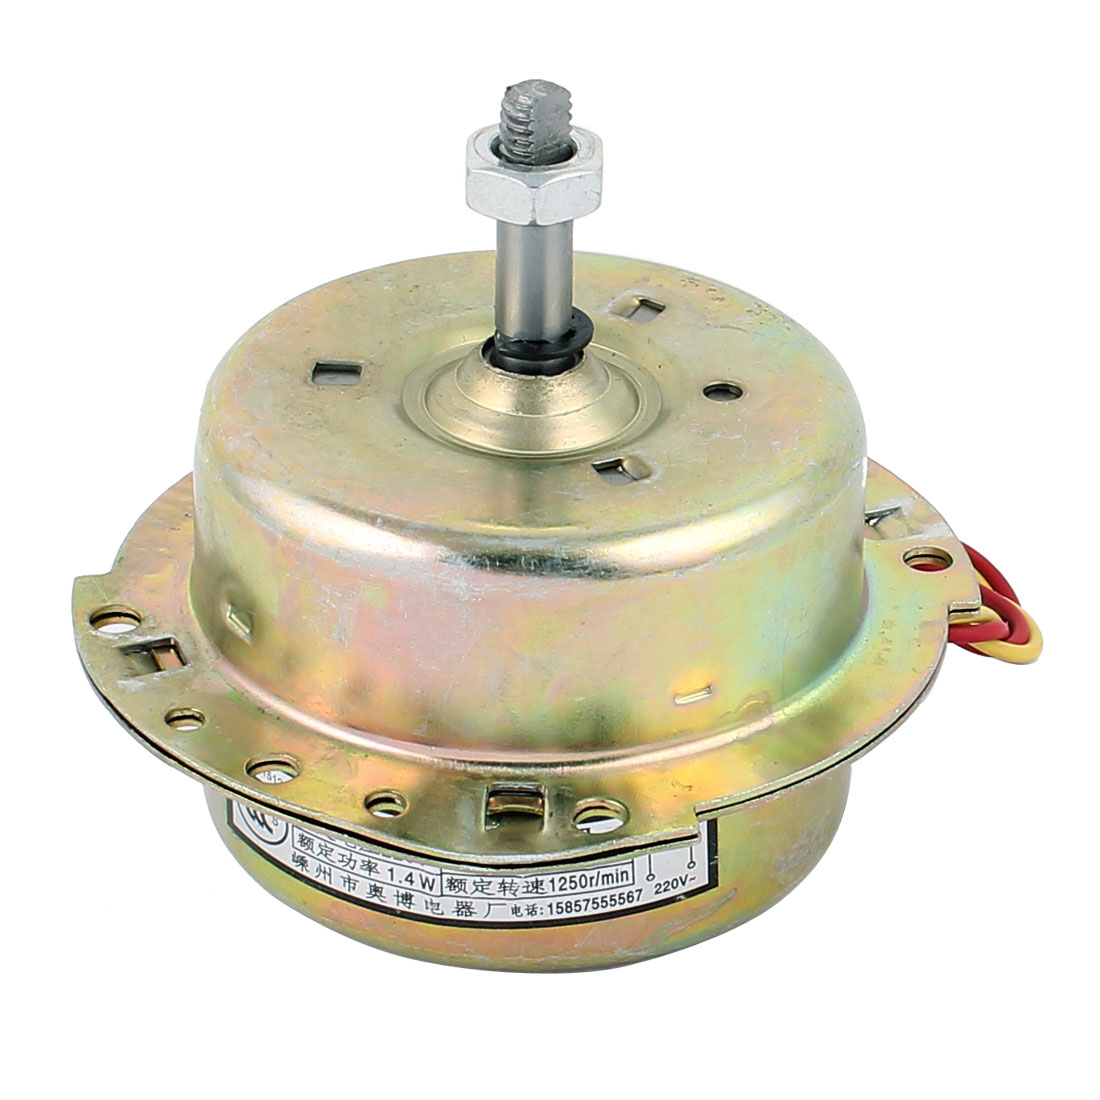 AC 220V 1.4W 1250RPM 8mmx30mm CW Rotating Electrical Ventilator Fan Motor